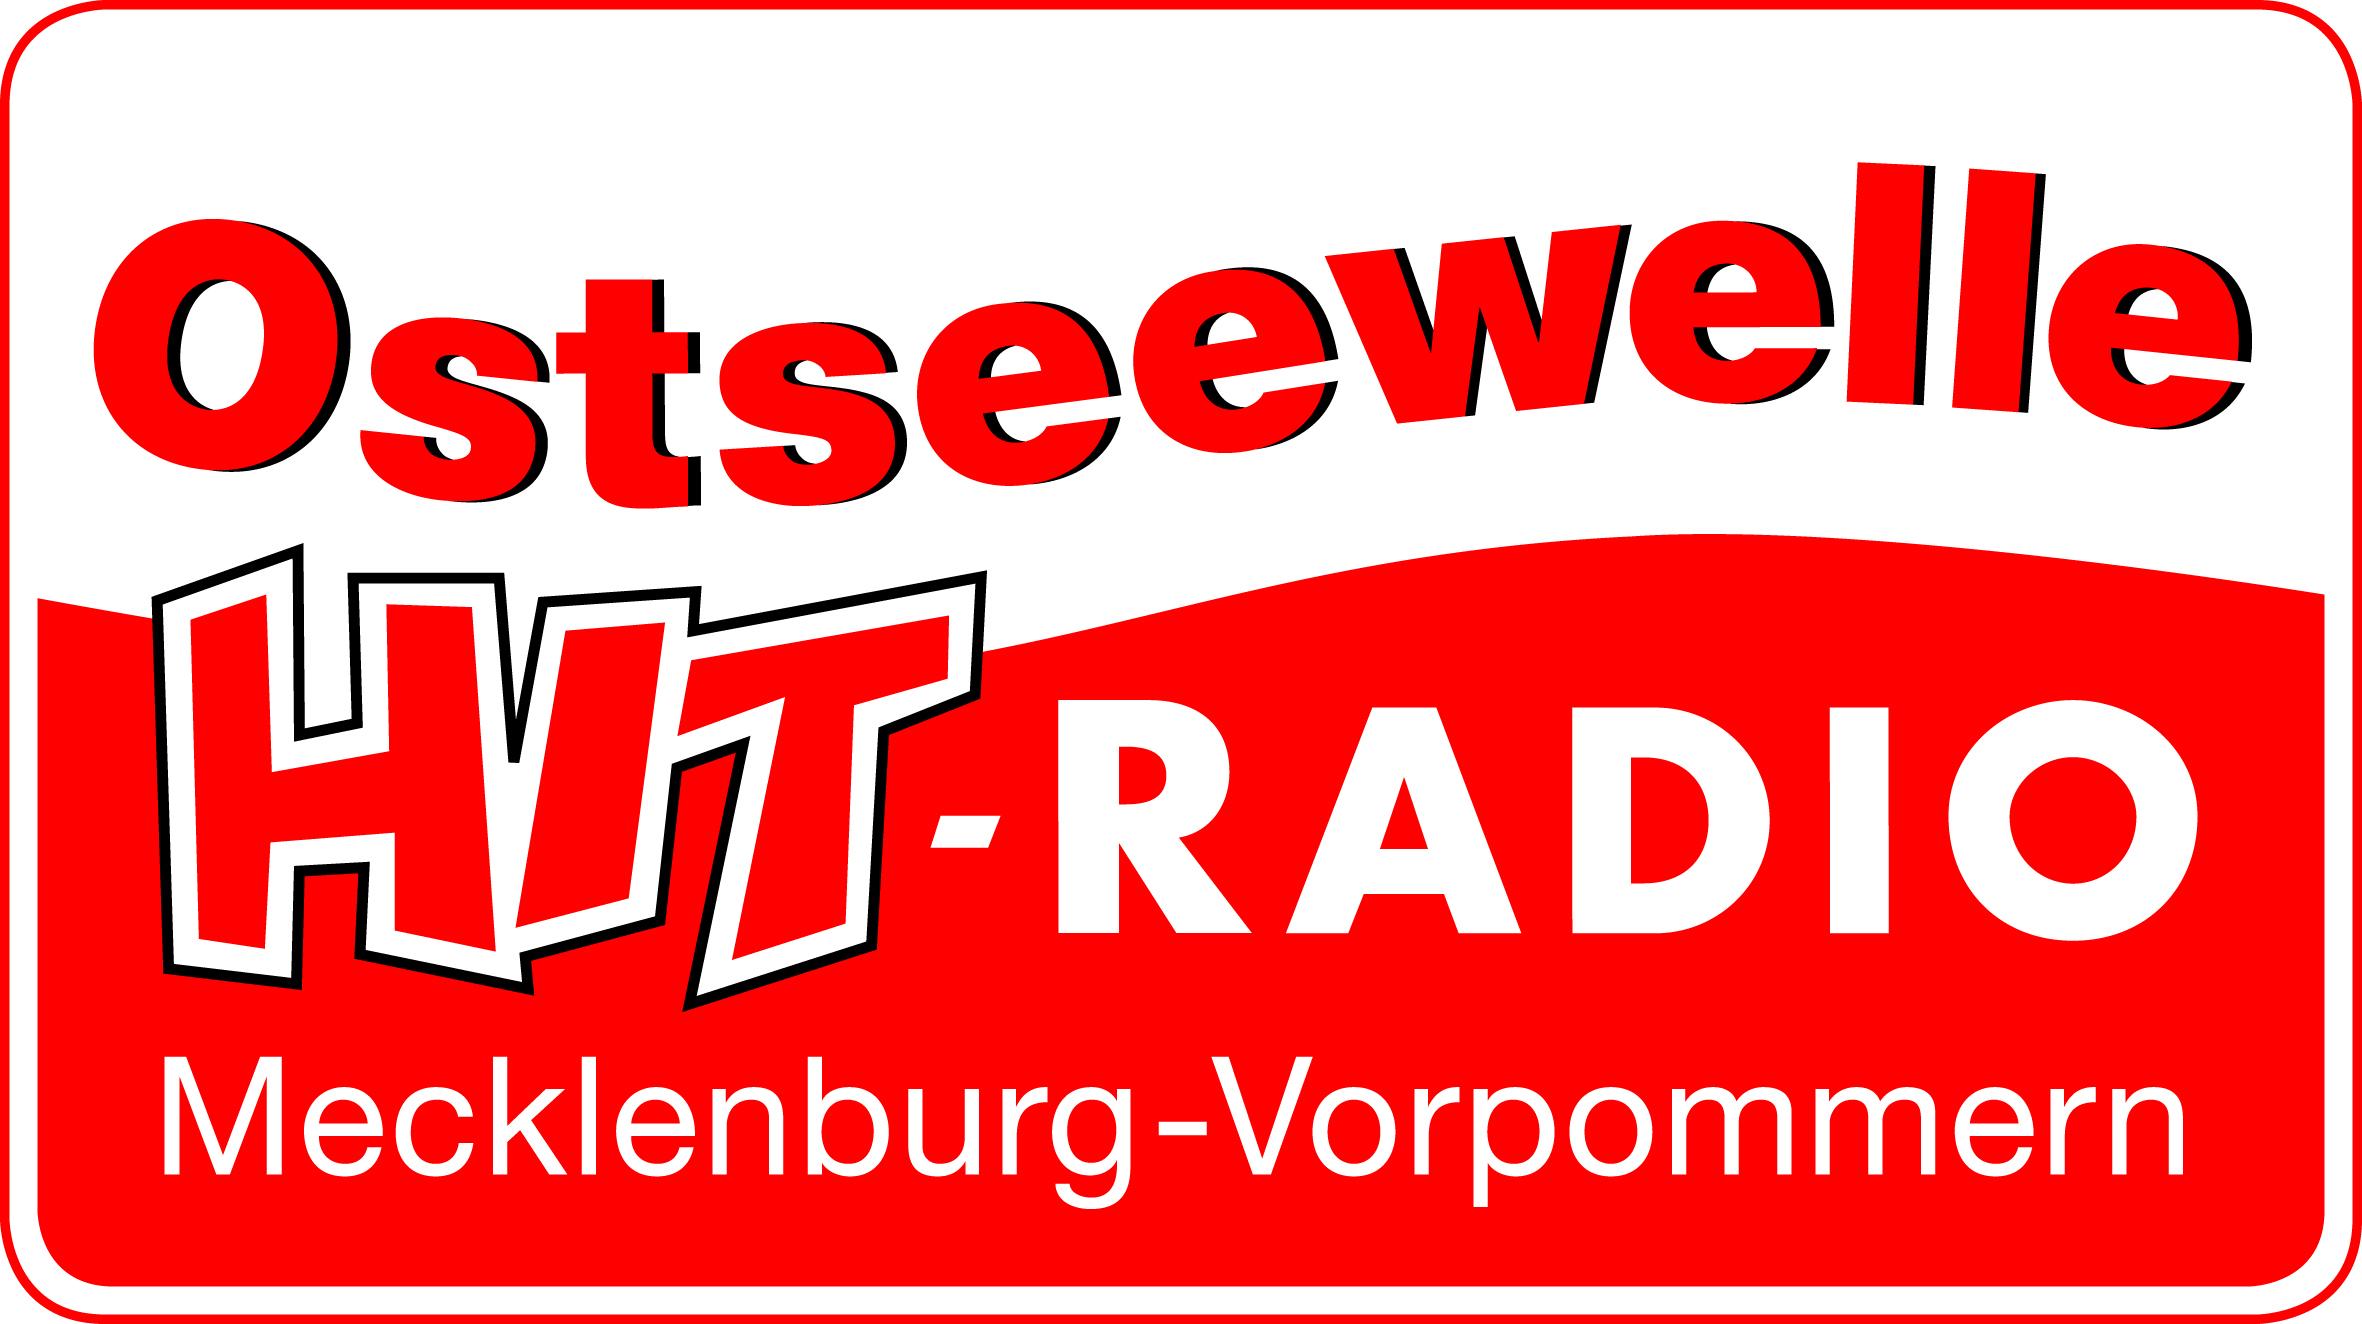 Ostseewelle HIT RADIO Mecklenburg Vorpommern